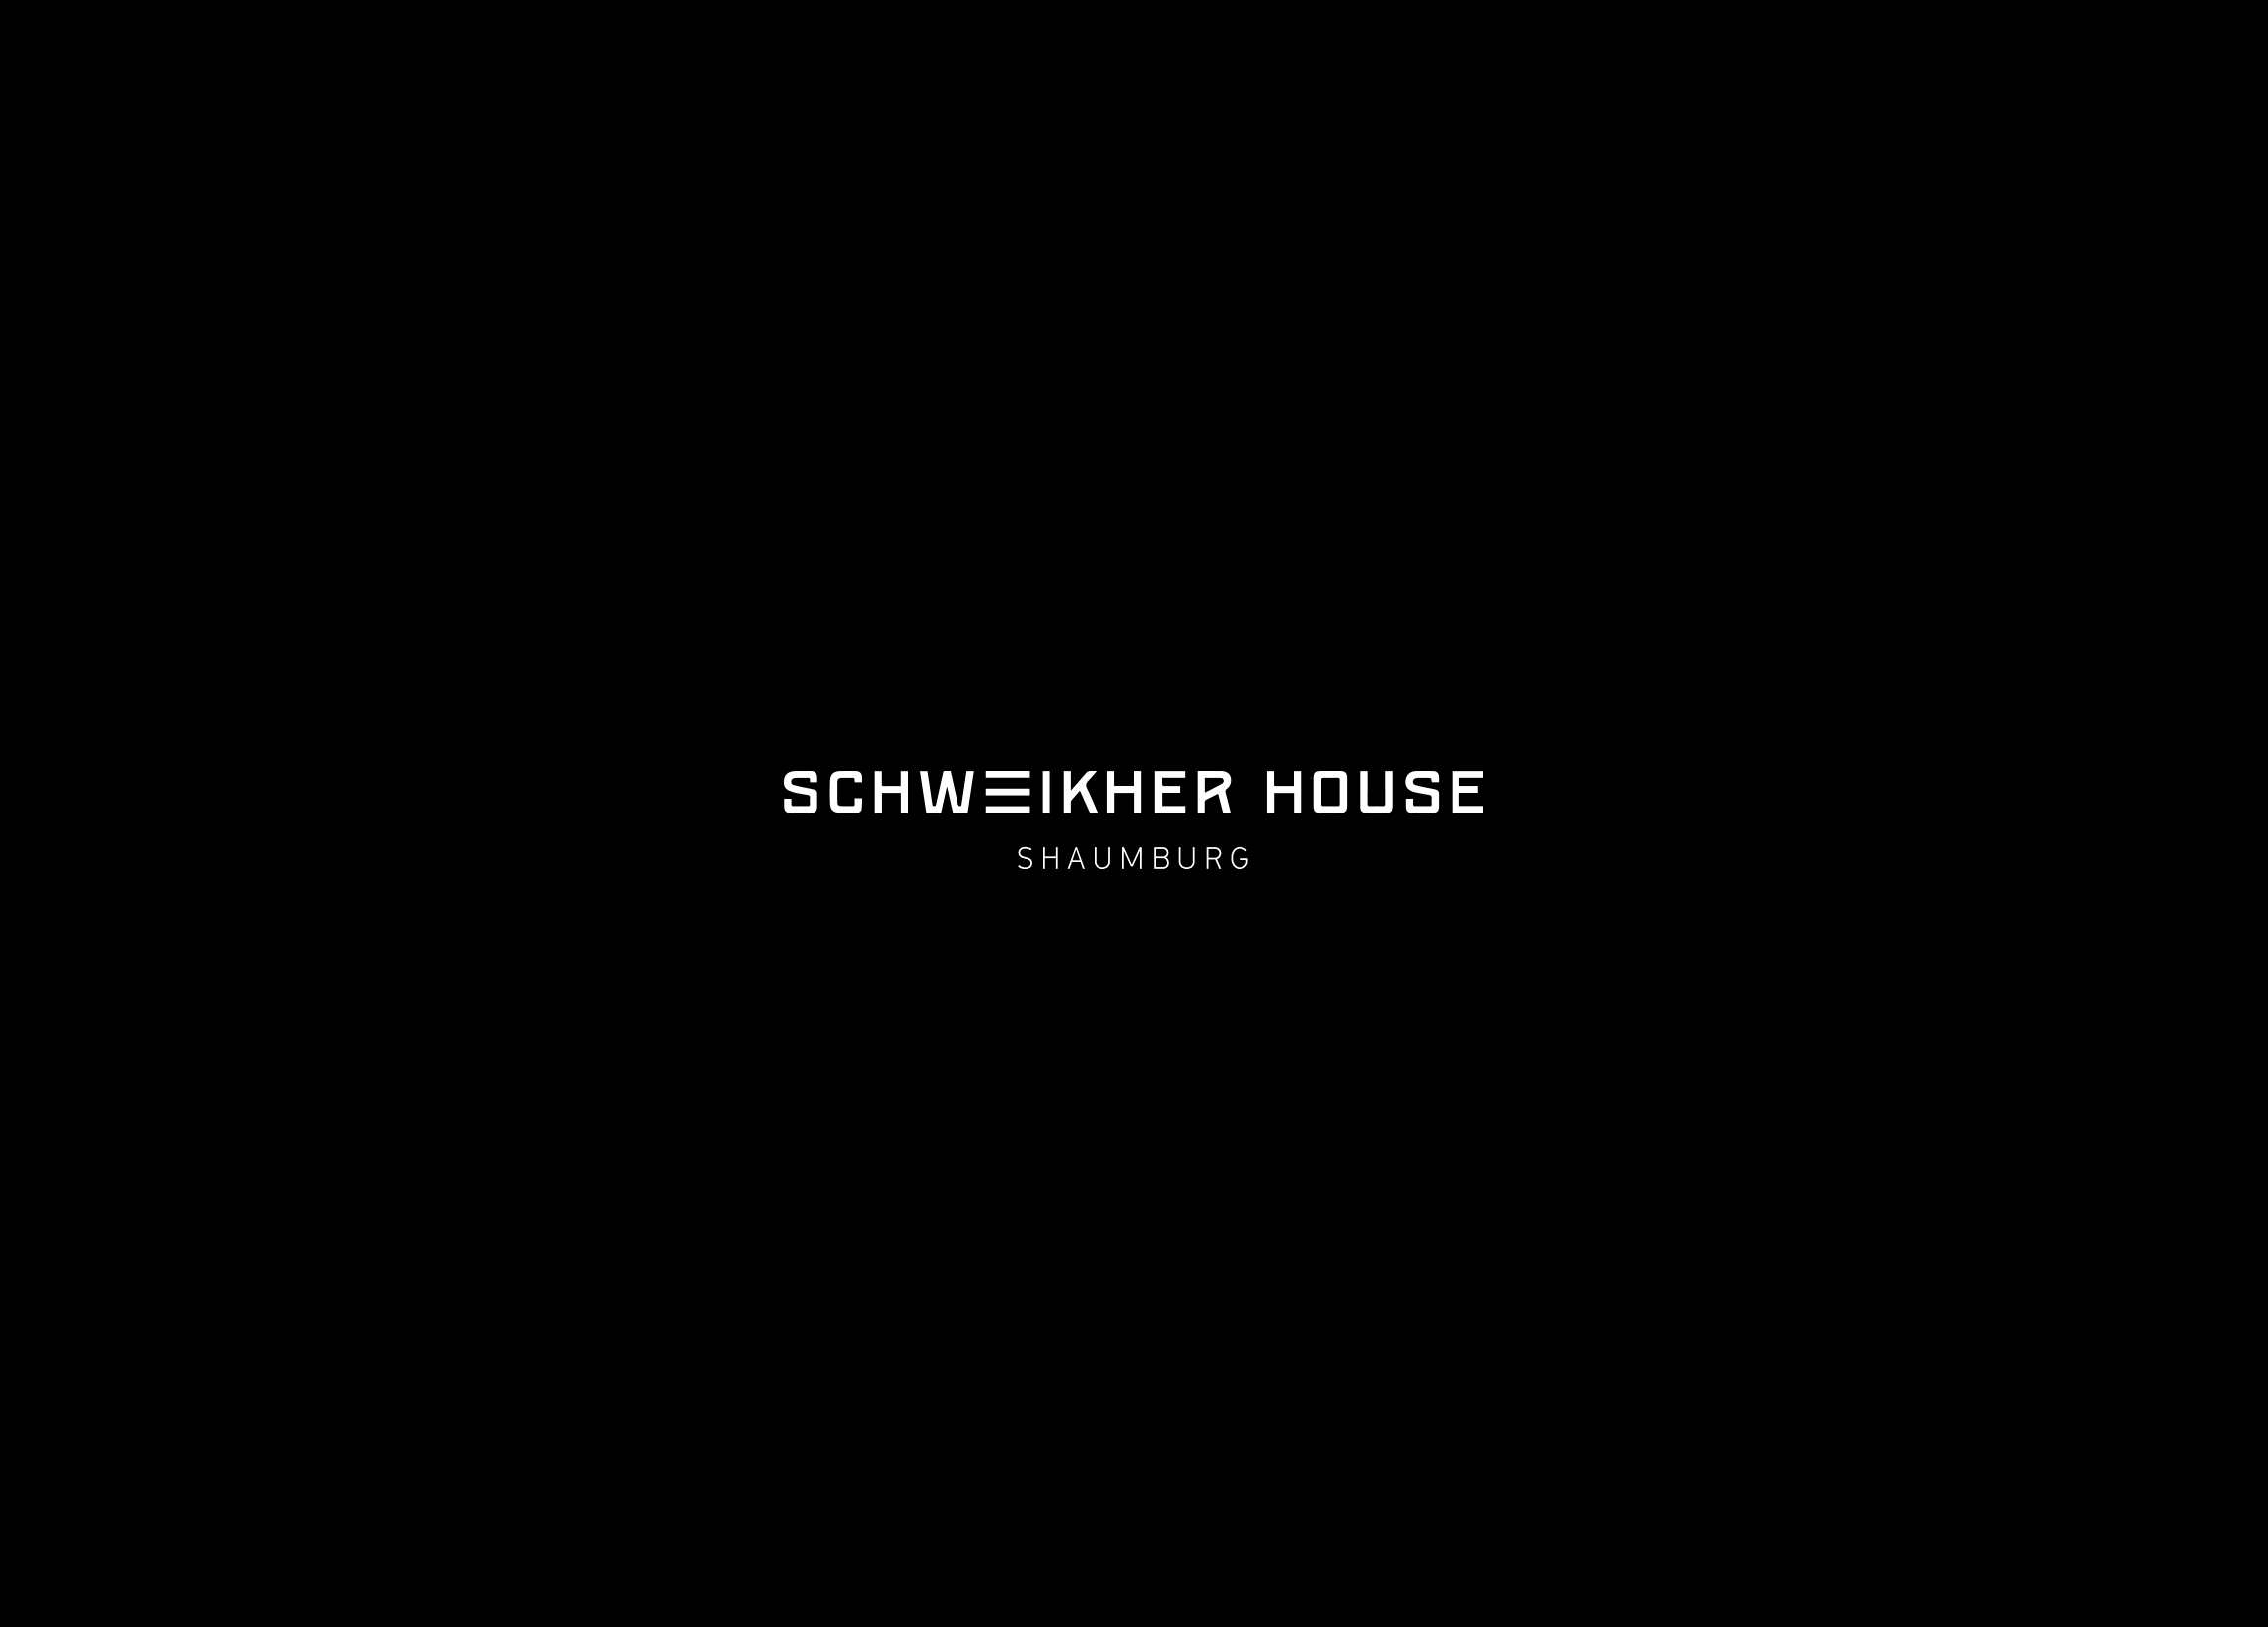 schweikher_logo.png